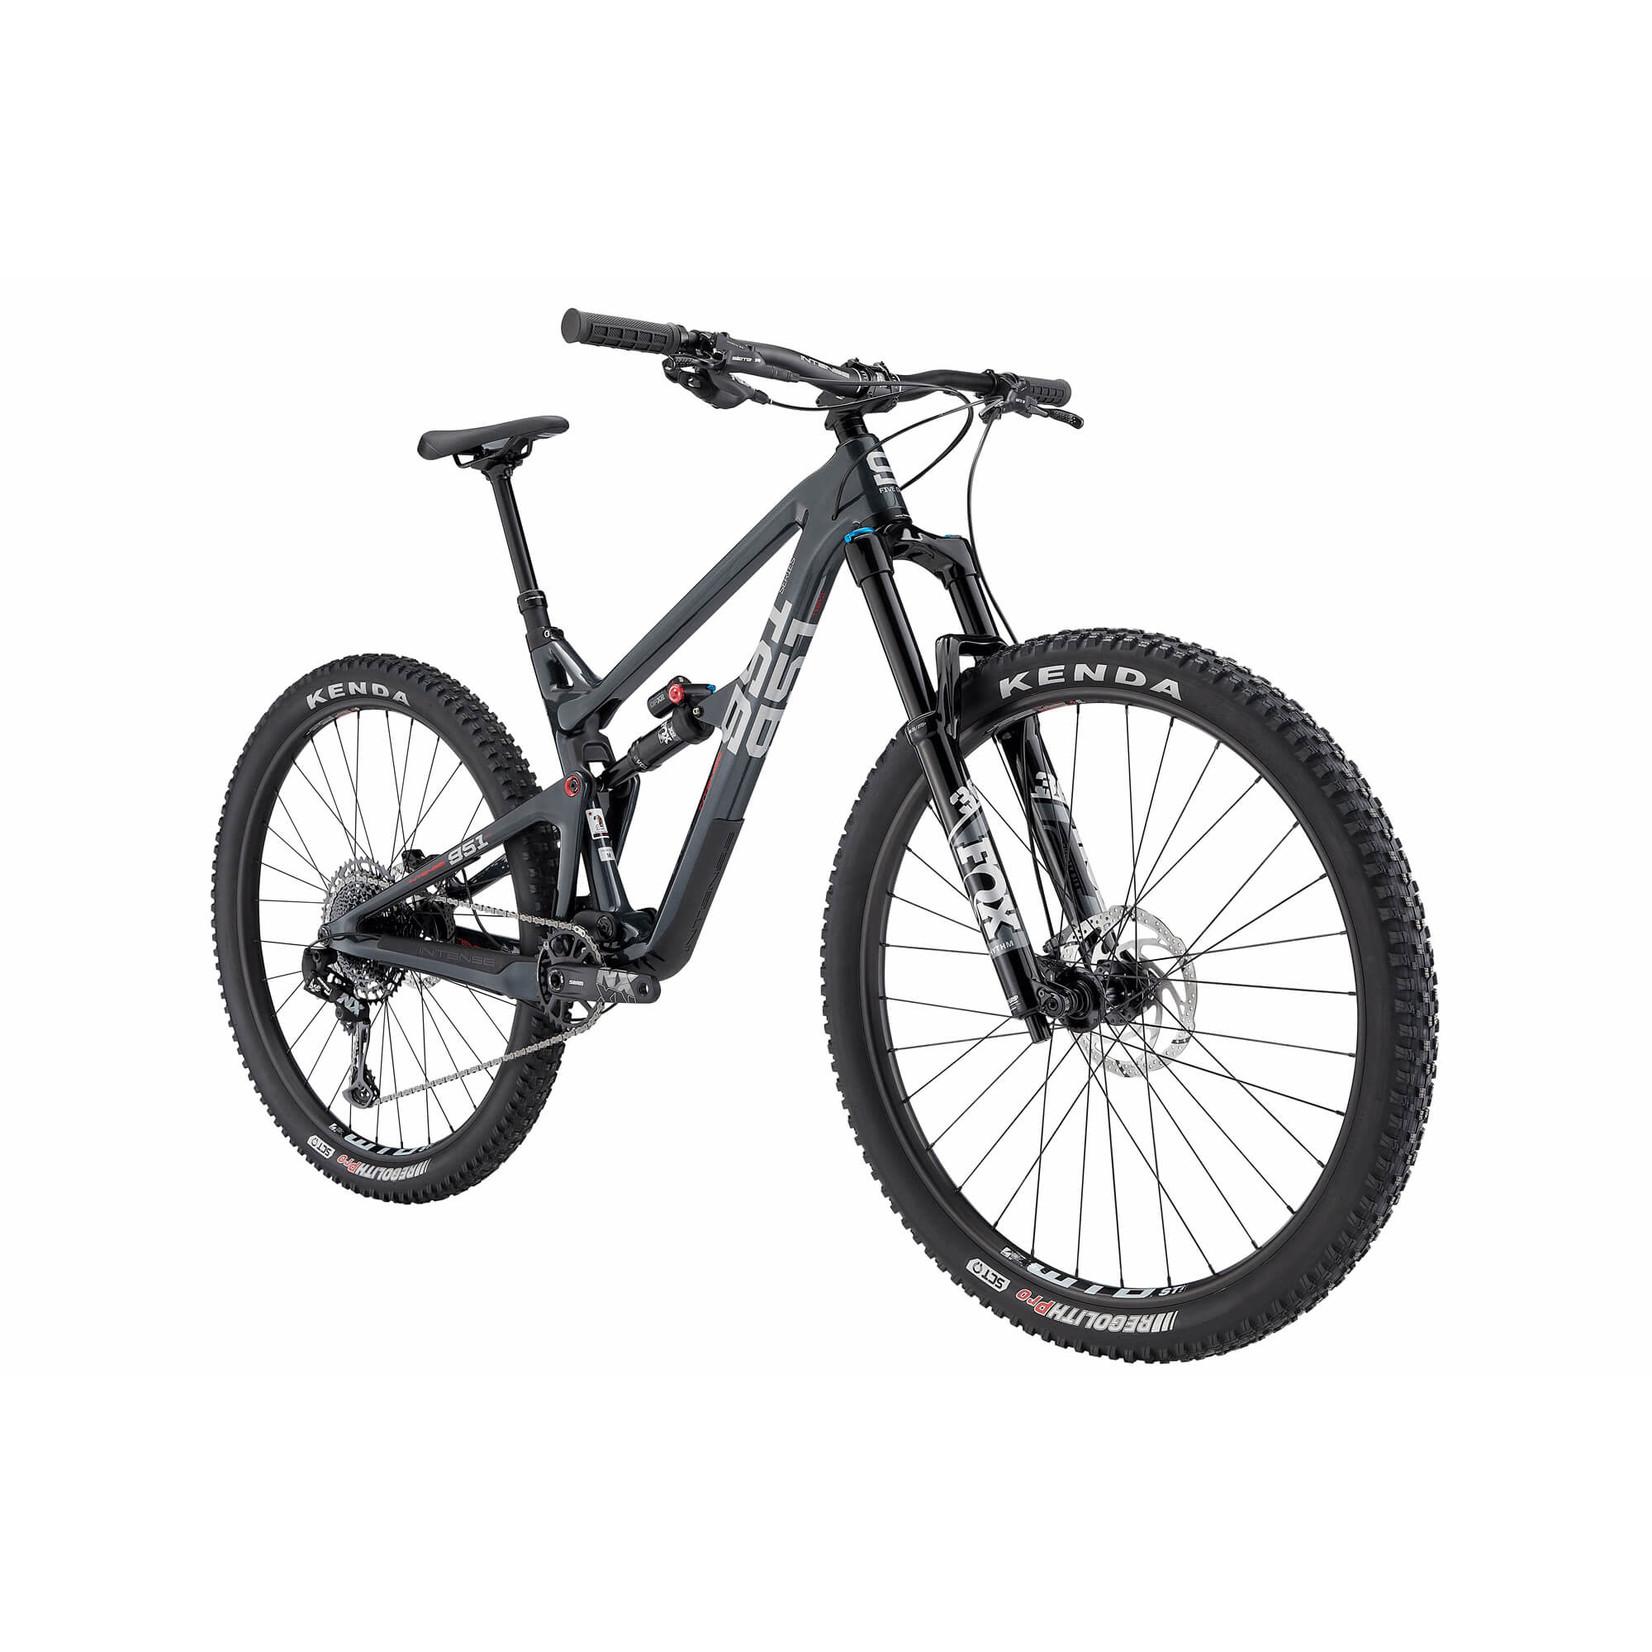 Intense Cycles 2022 Intense 951 Trail Sport - Gray - Large